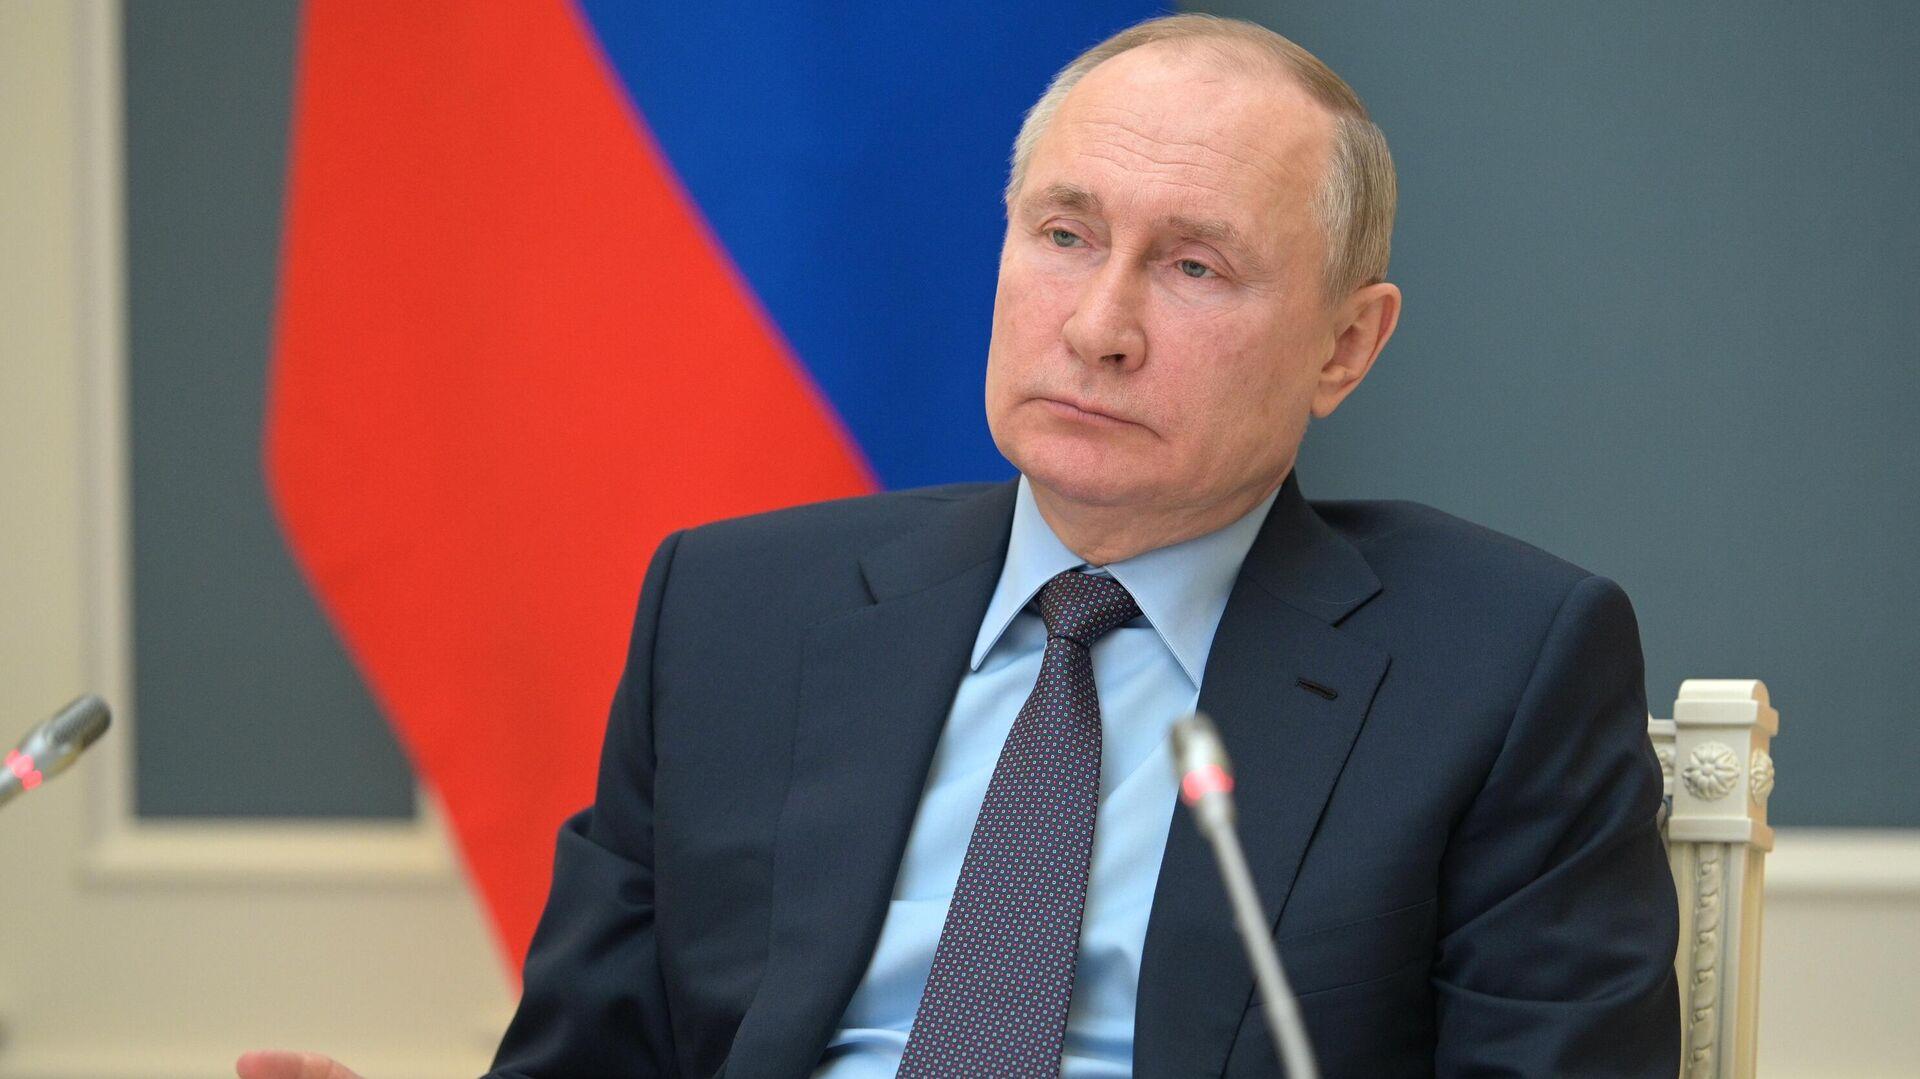 Vladímir Putin, el presidente ruso - Sputnik Mundo, 1920, 30.04.2021